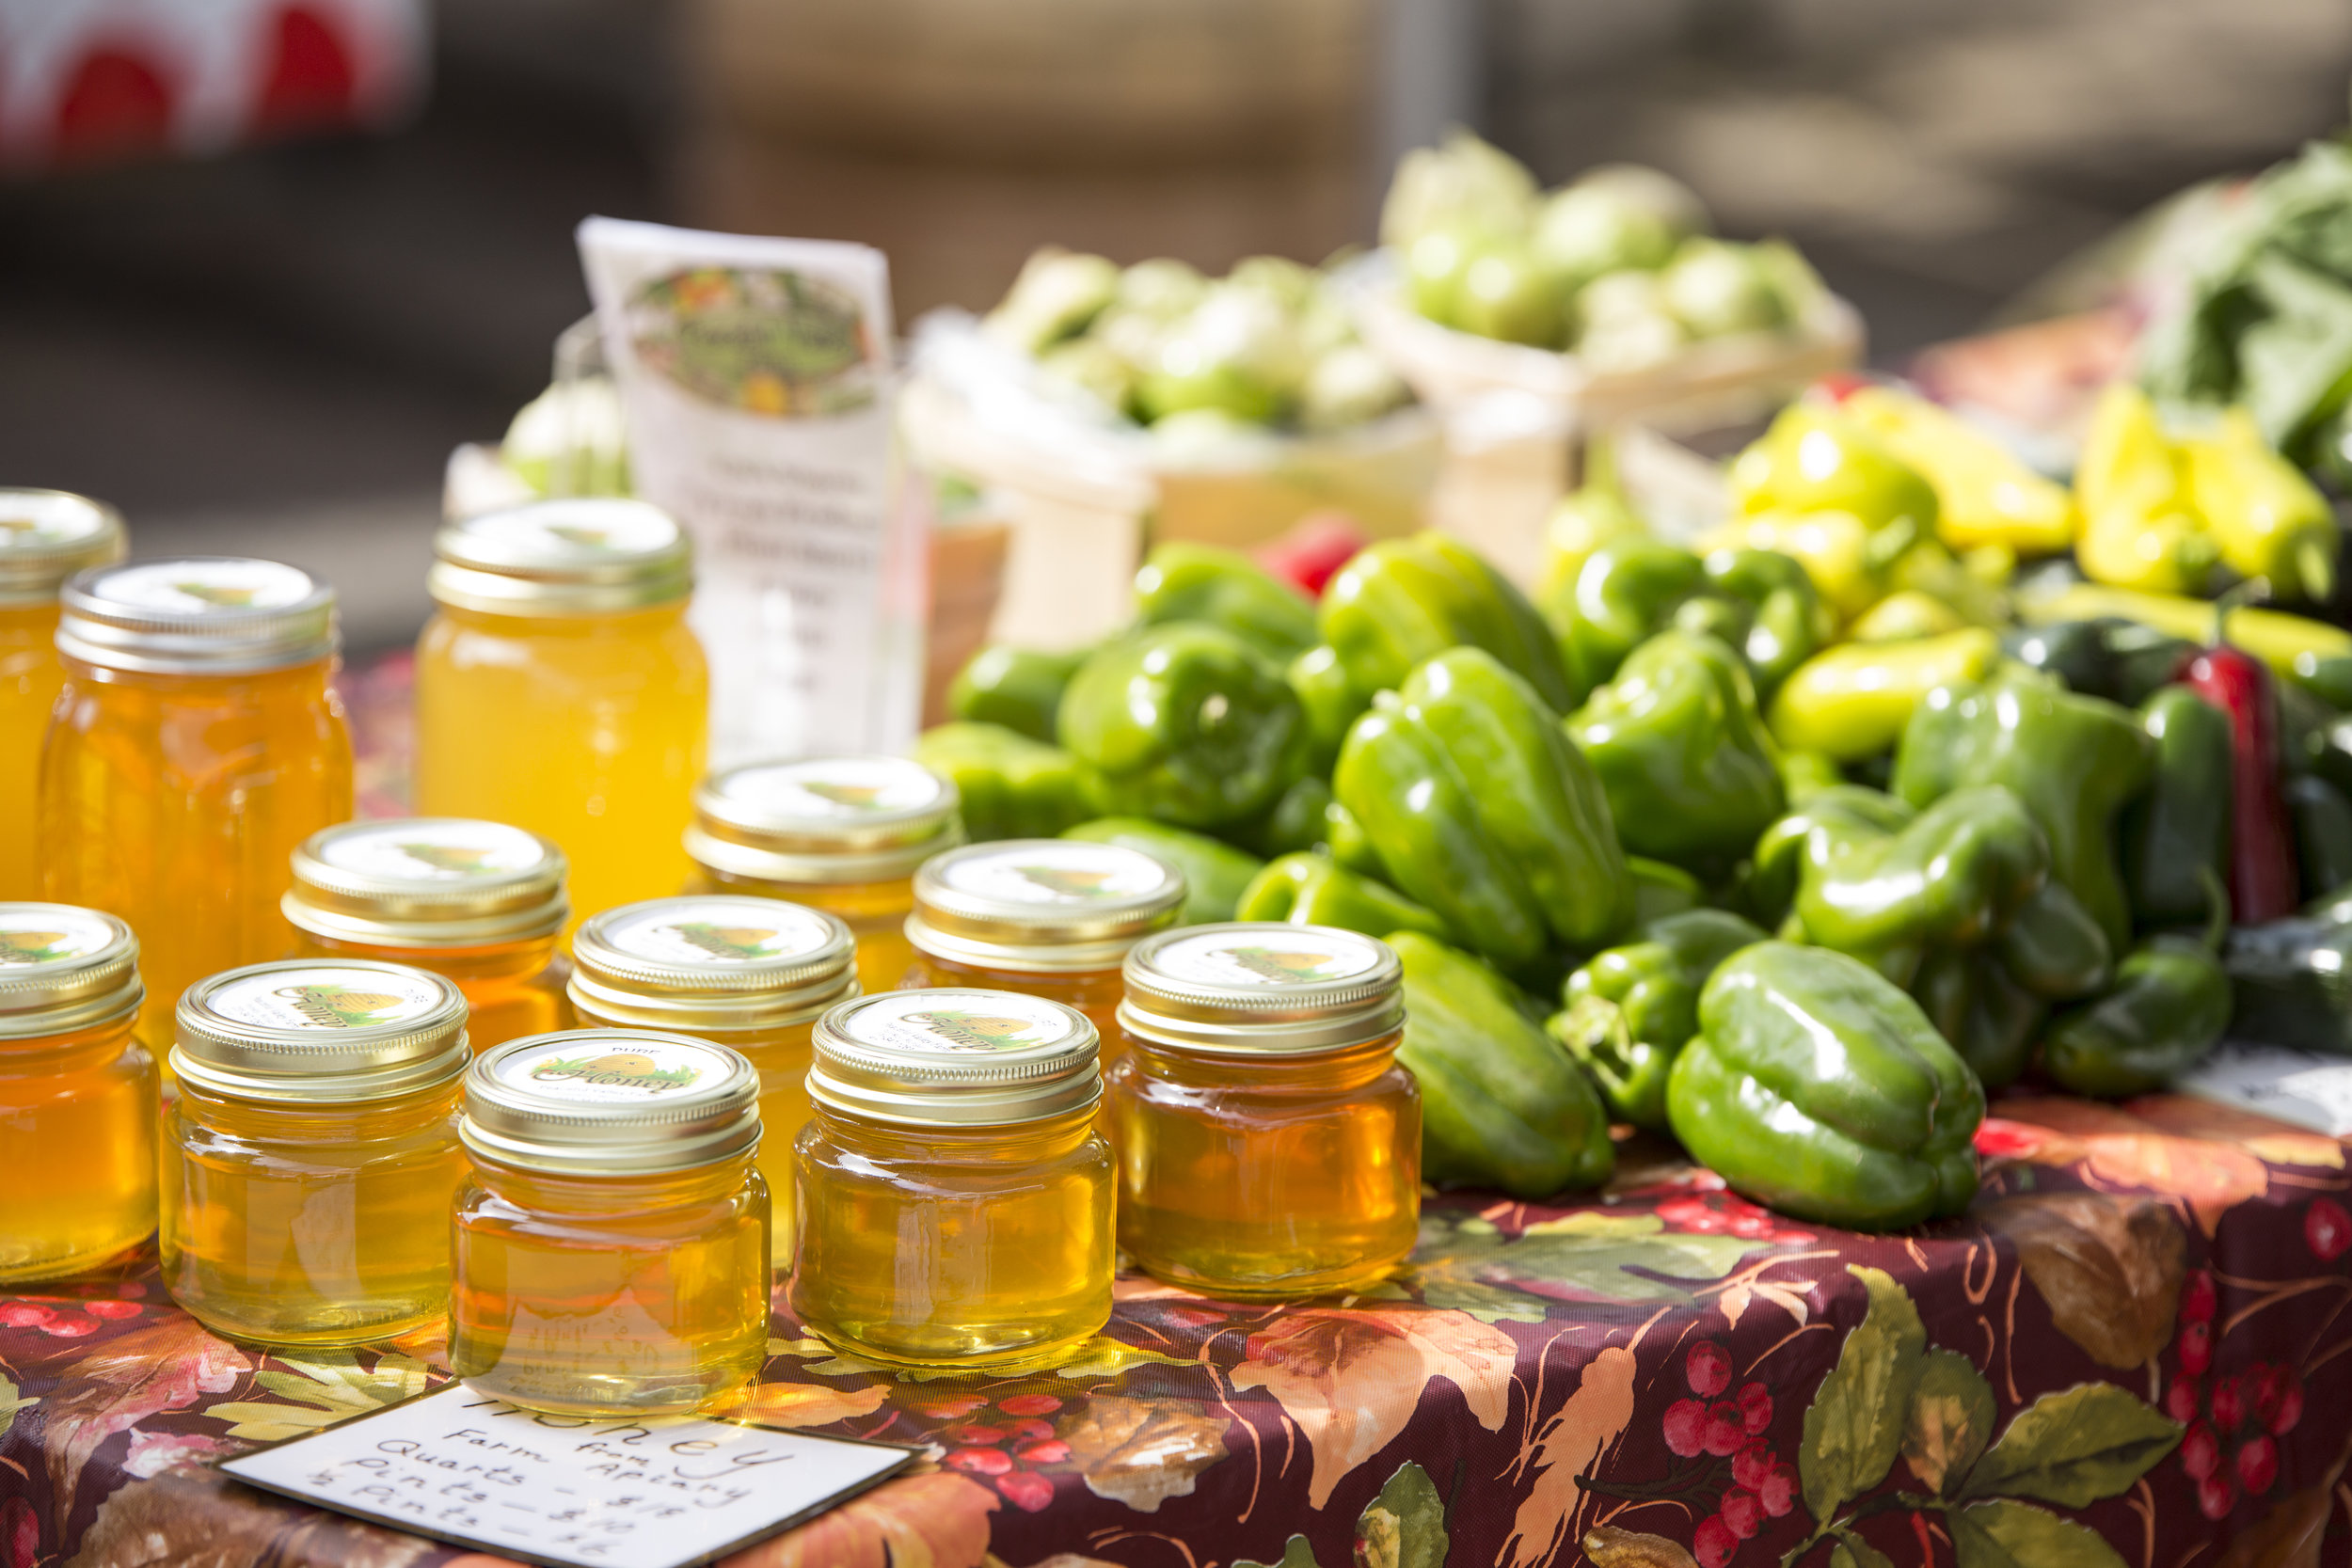 Farmers Market Goods-8.jpg